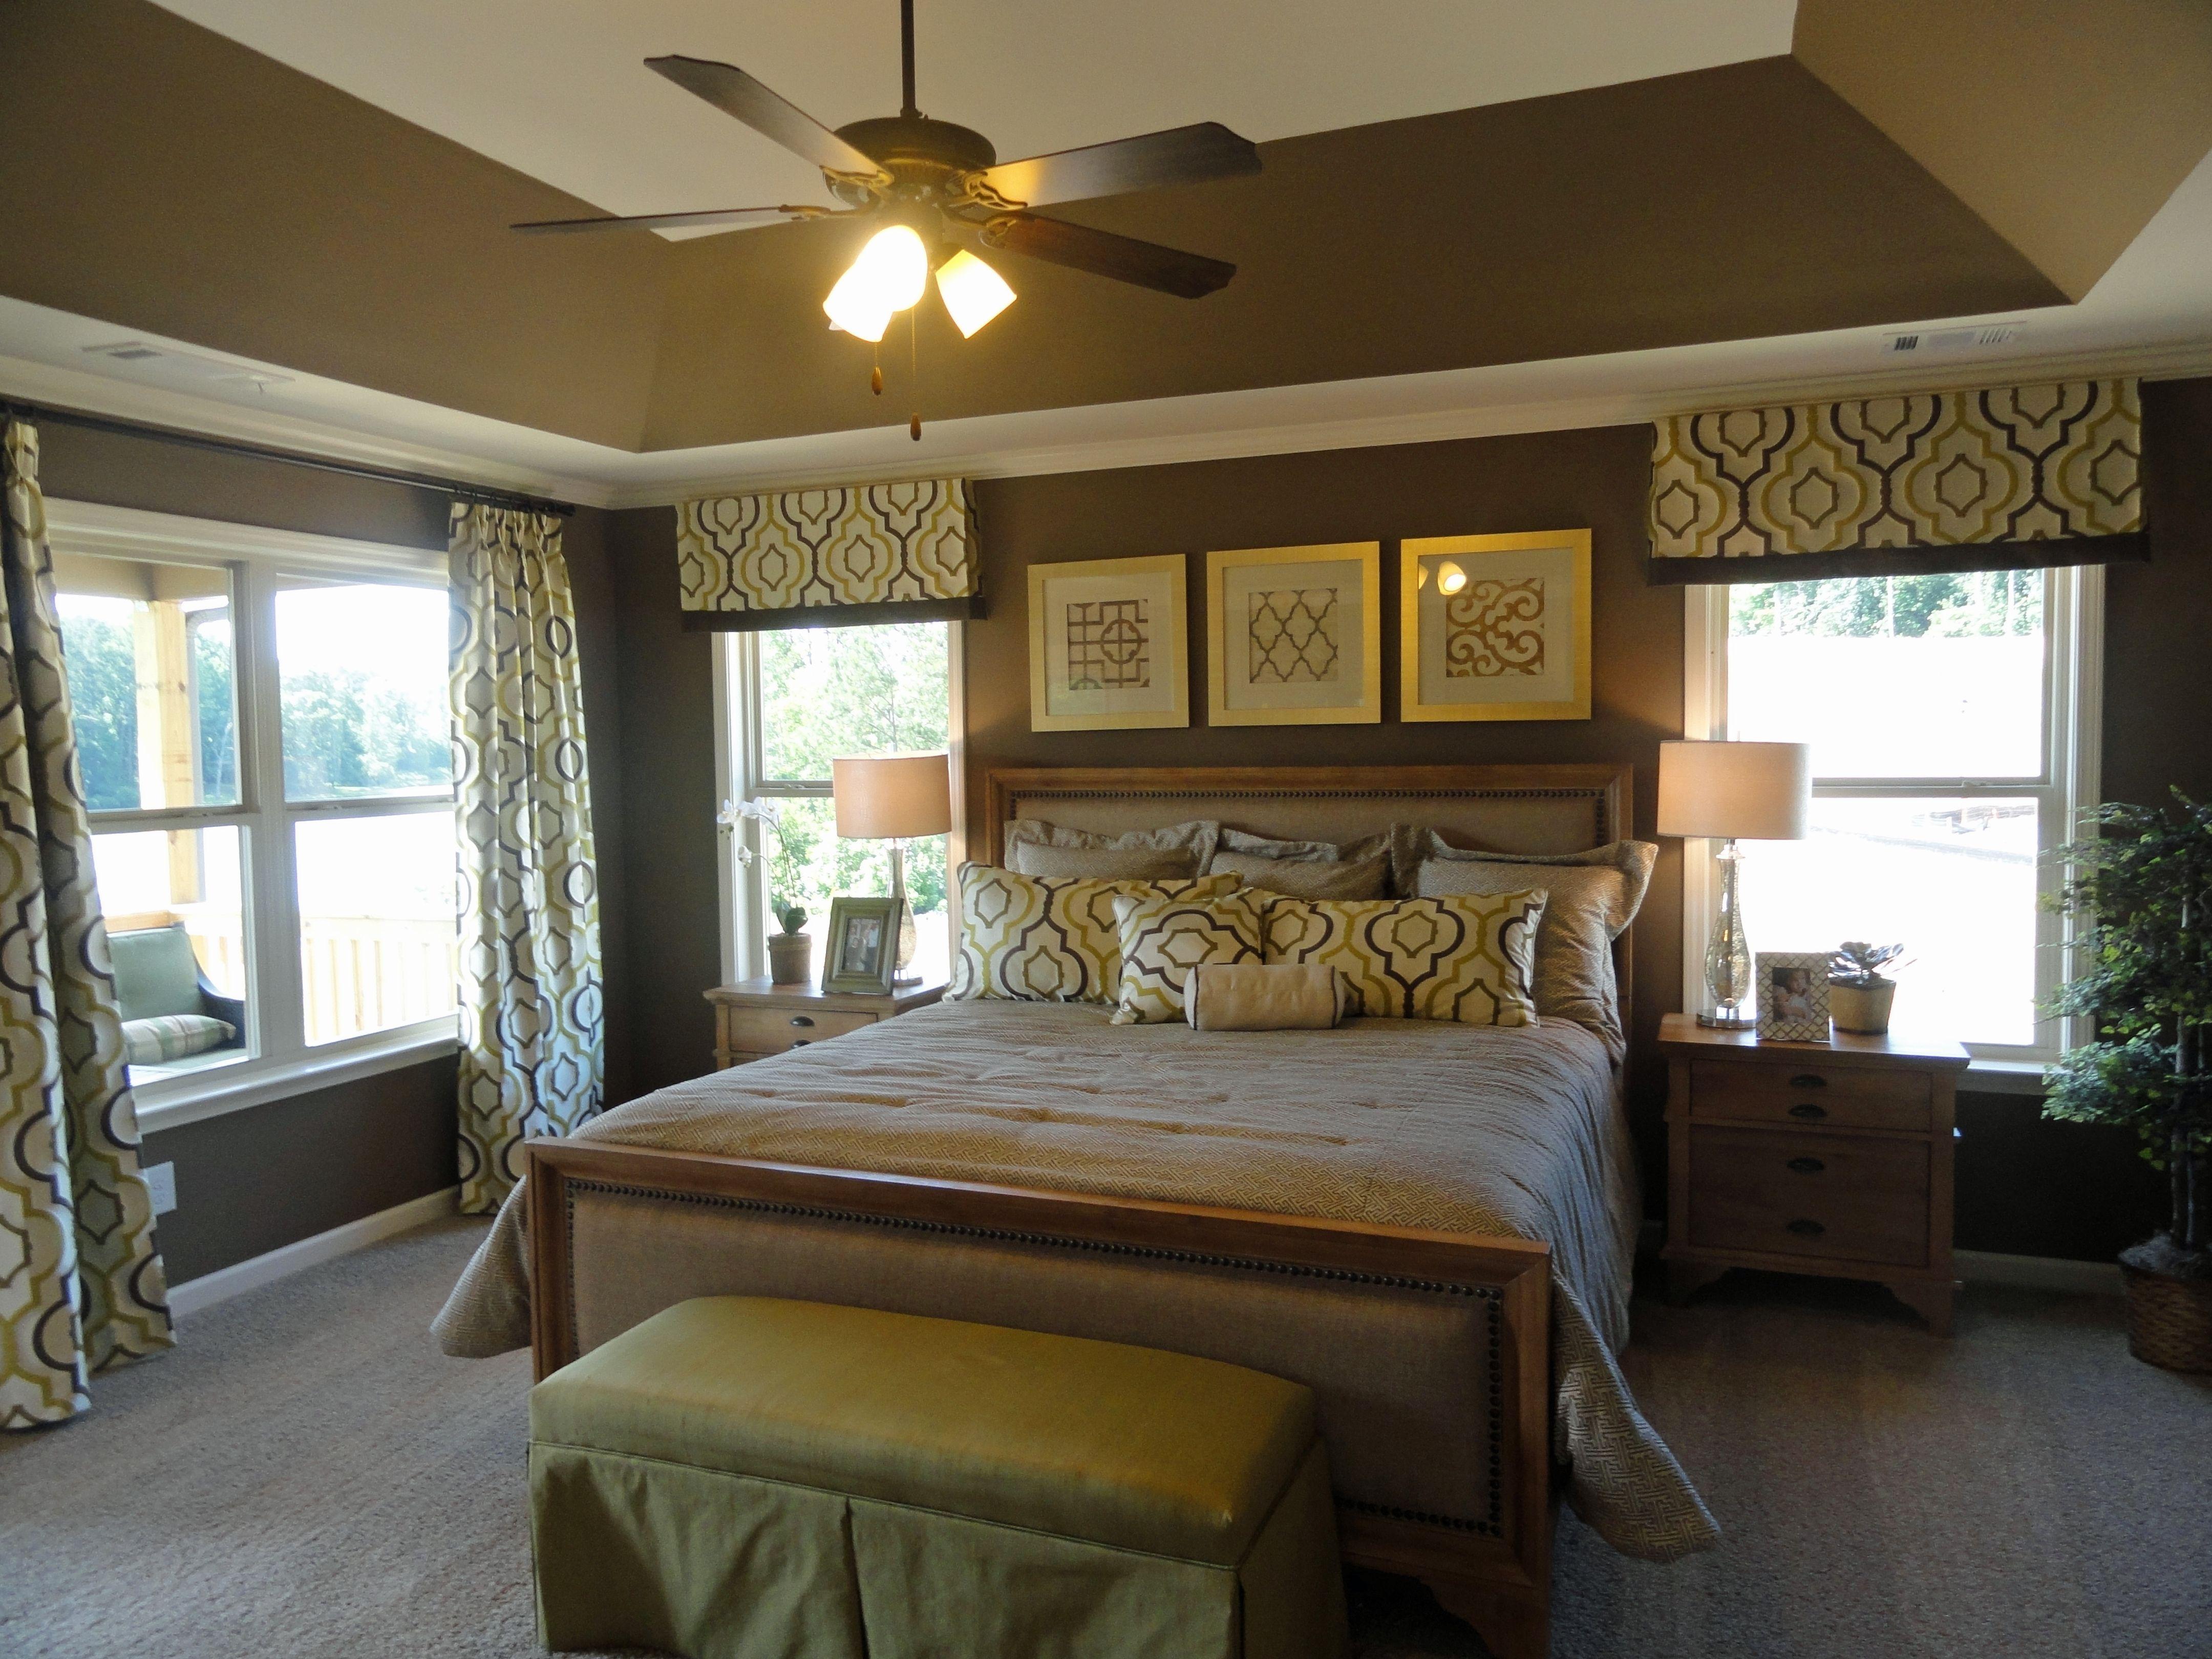 model homes master bedrooms   model home grand opening ... on New Model Bedroom Design  id=81204